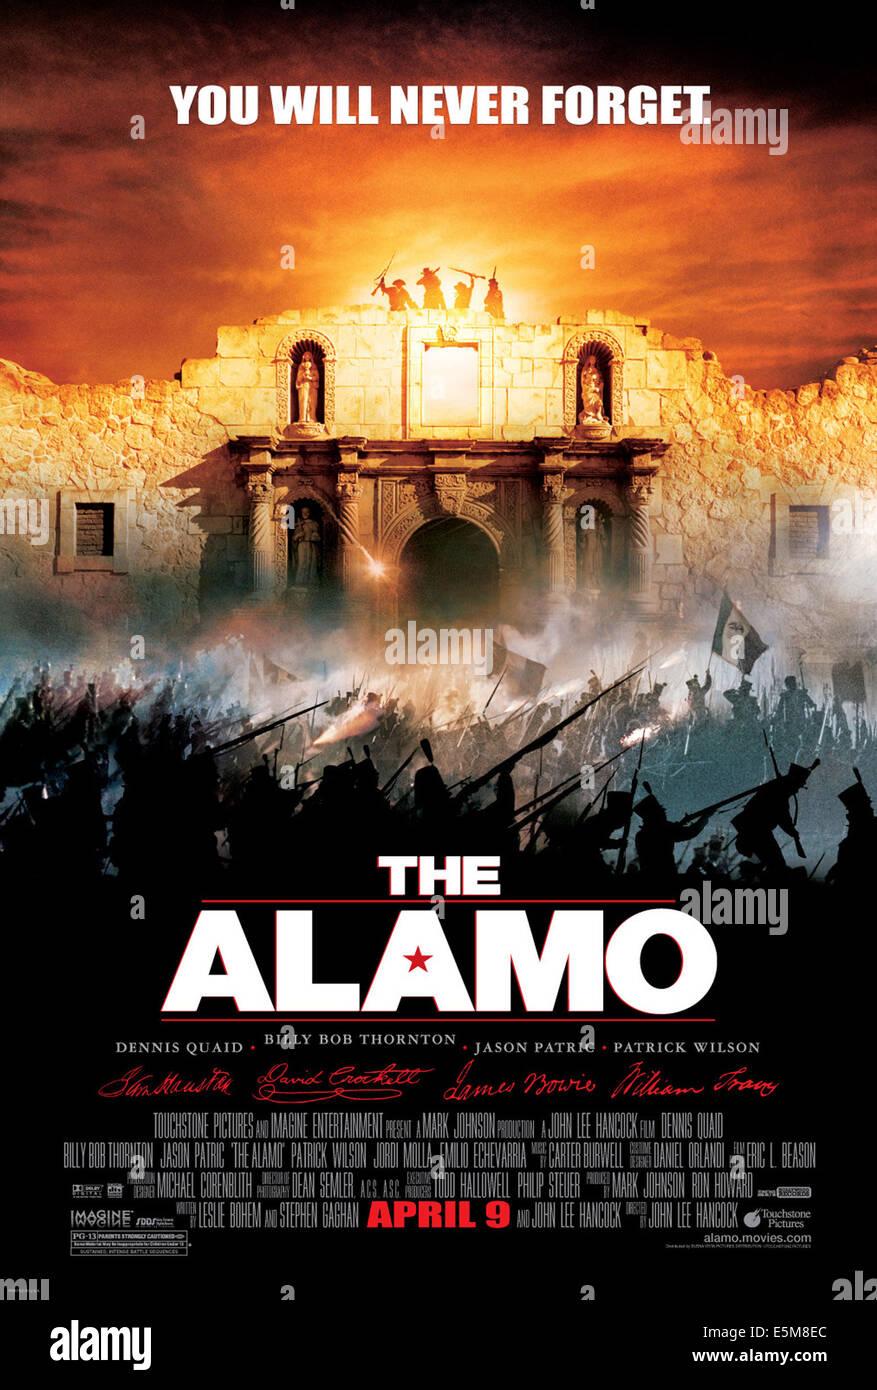 THE ALAMO, 2004, (c) Touchstone/courtesy Everett Collection - Stock Image